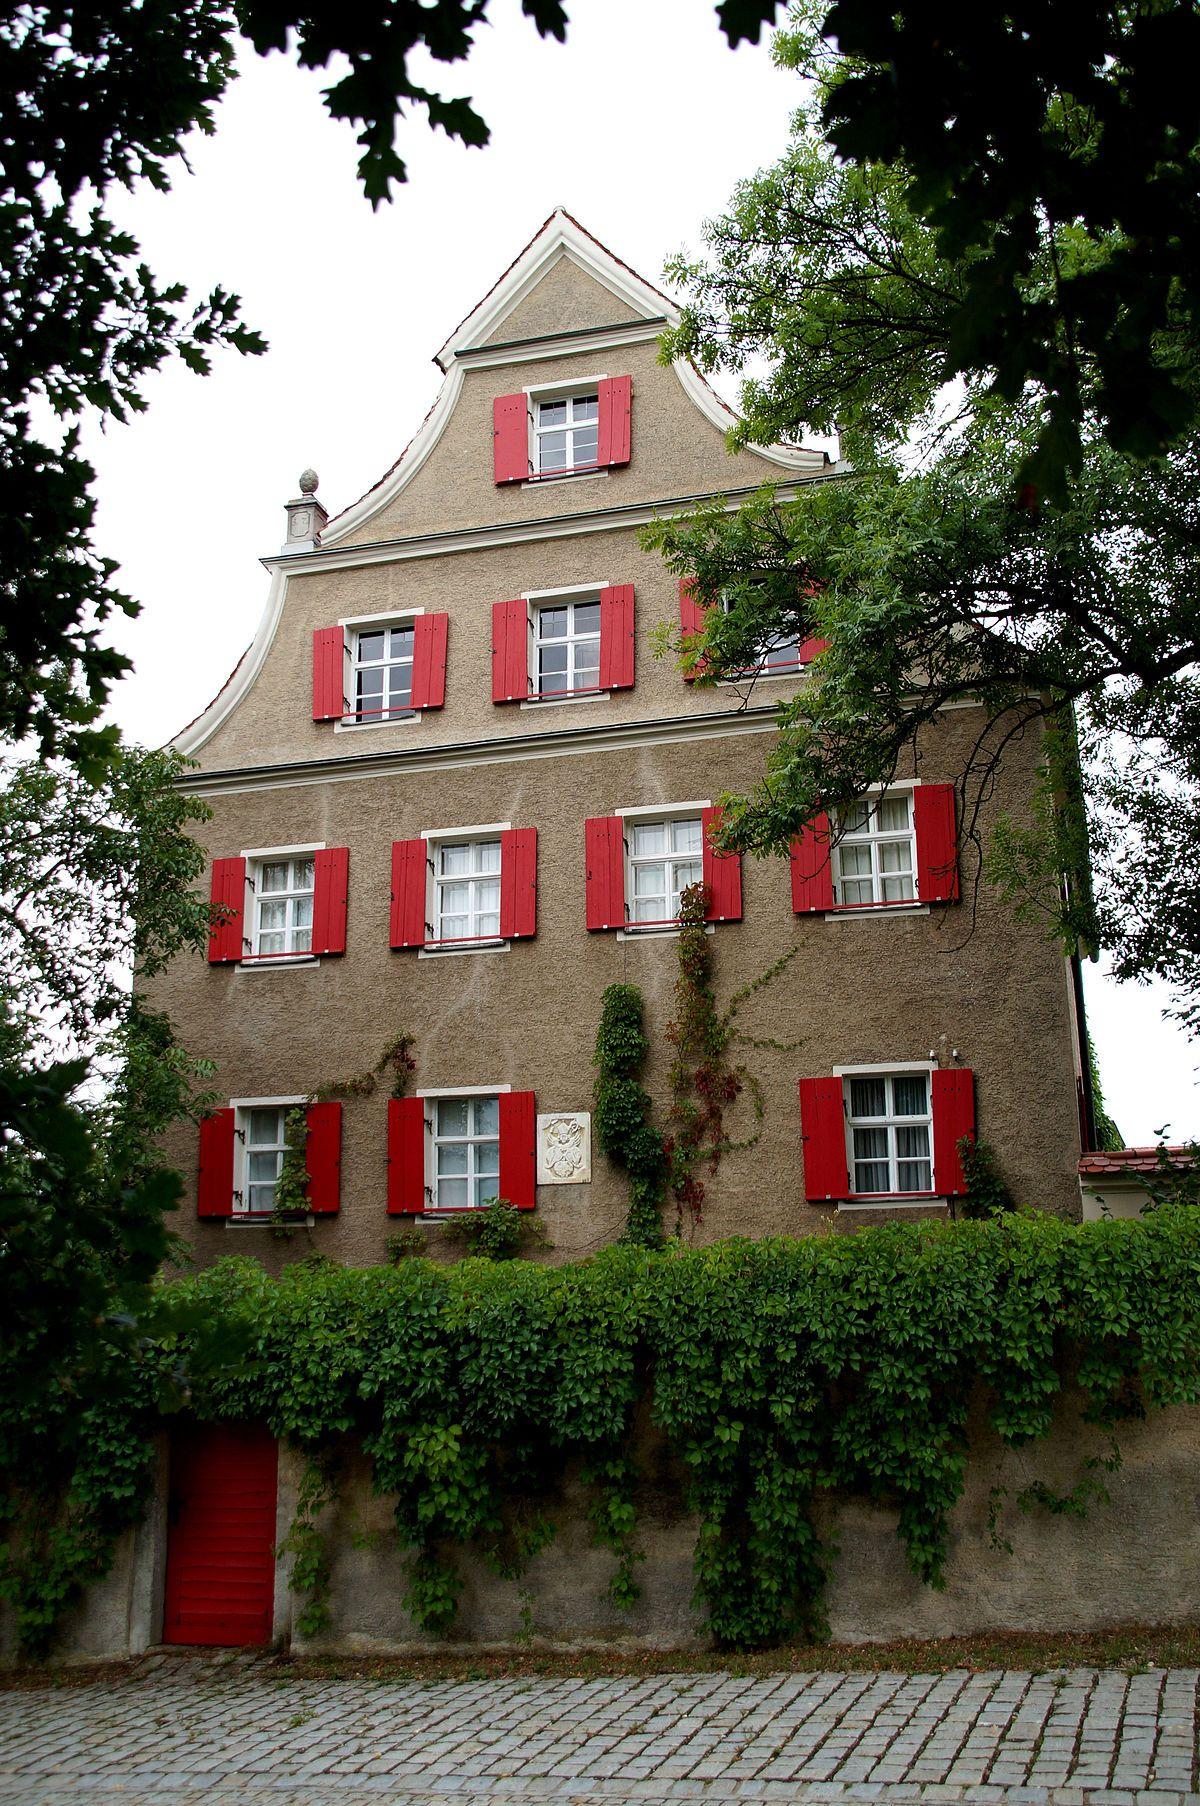 Https De M Wikipedia Org Wiki Schloss Hohengebraching Wprov Sfla1 In 2020 Schloss Burg Walmdach